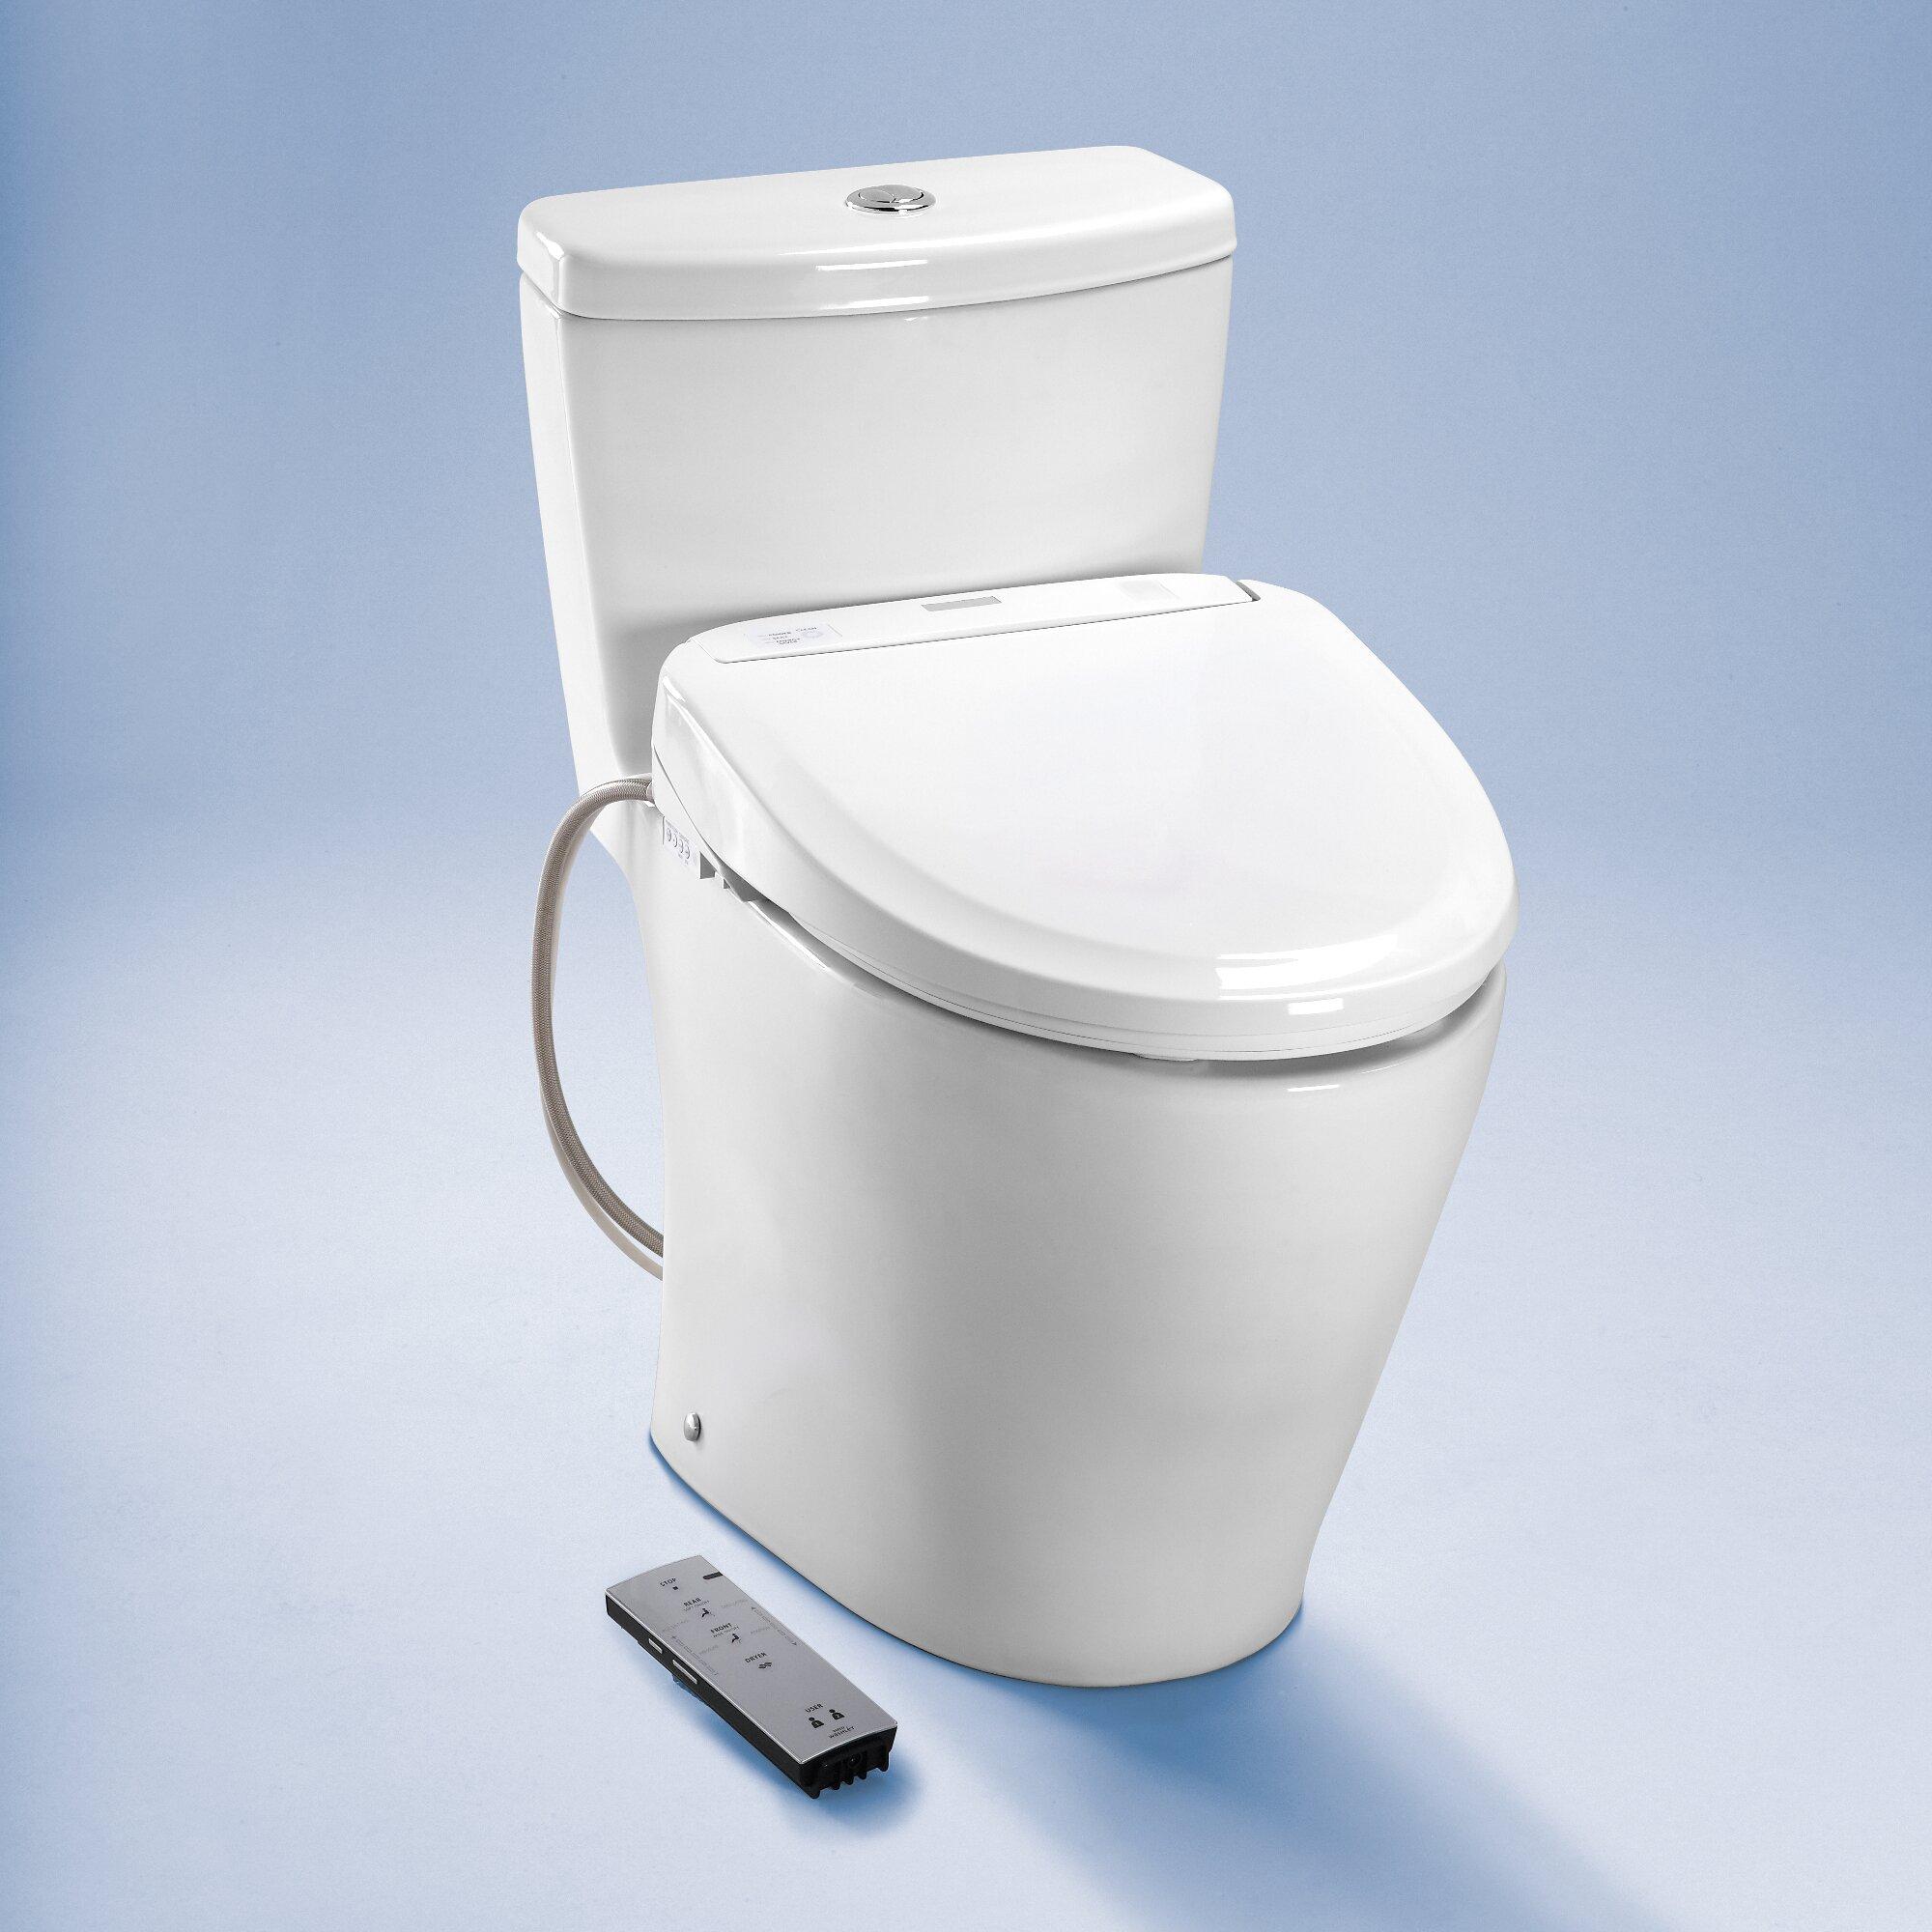 Toto Washlet Elongated Toilet Seat Bidet Amp Reviews